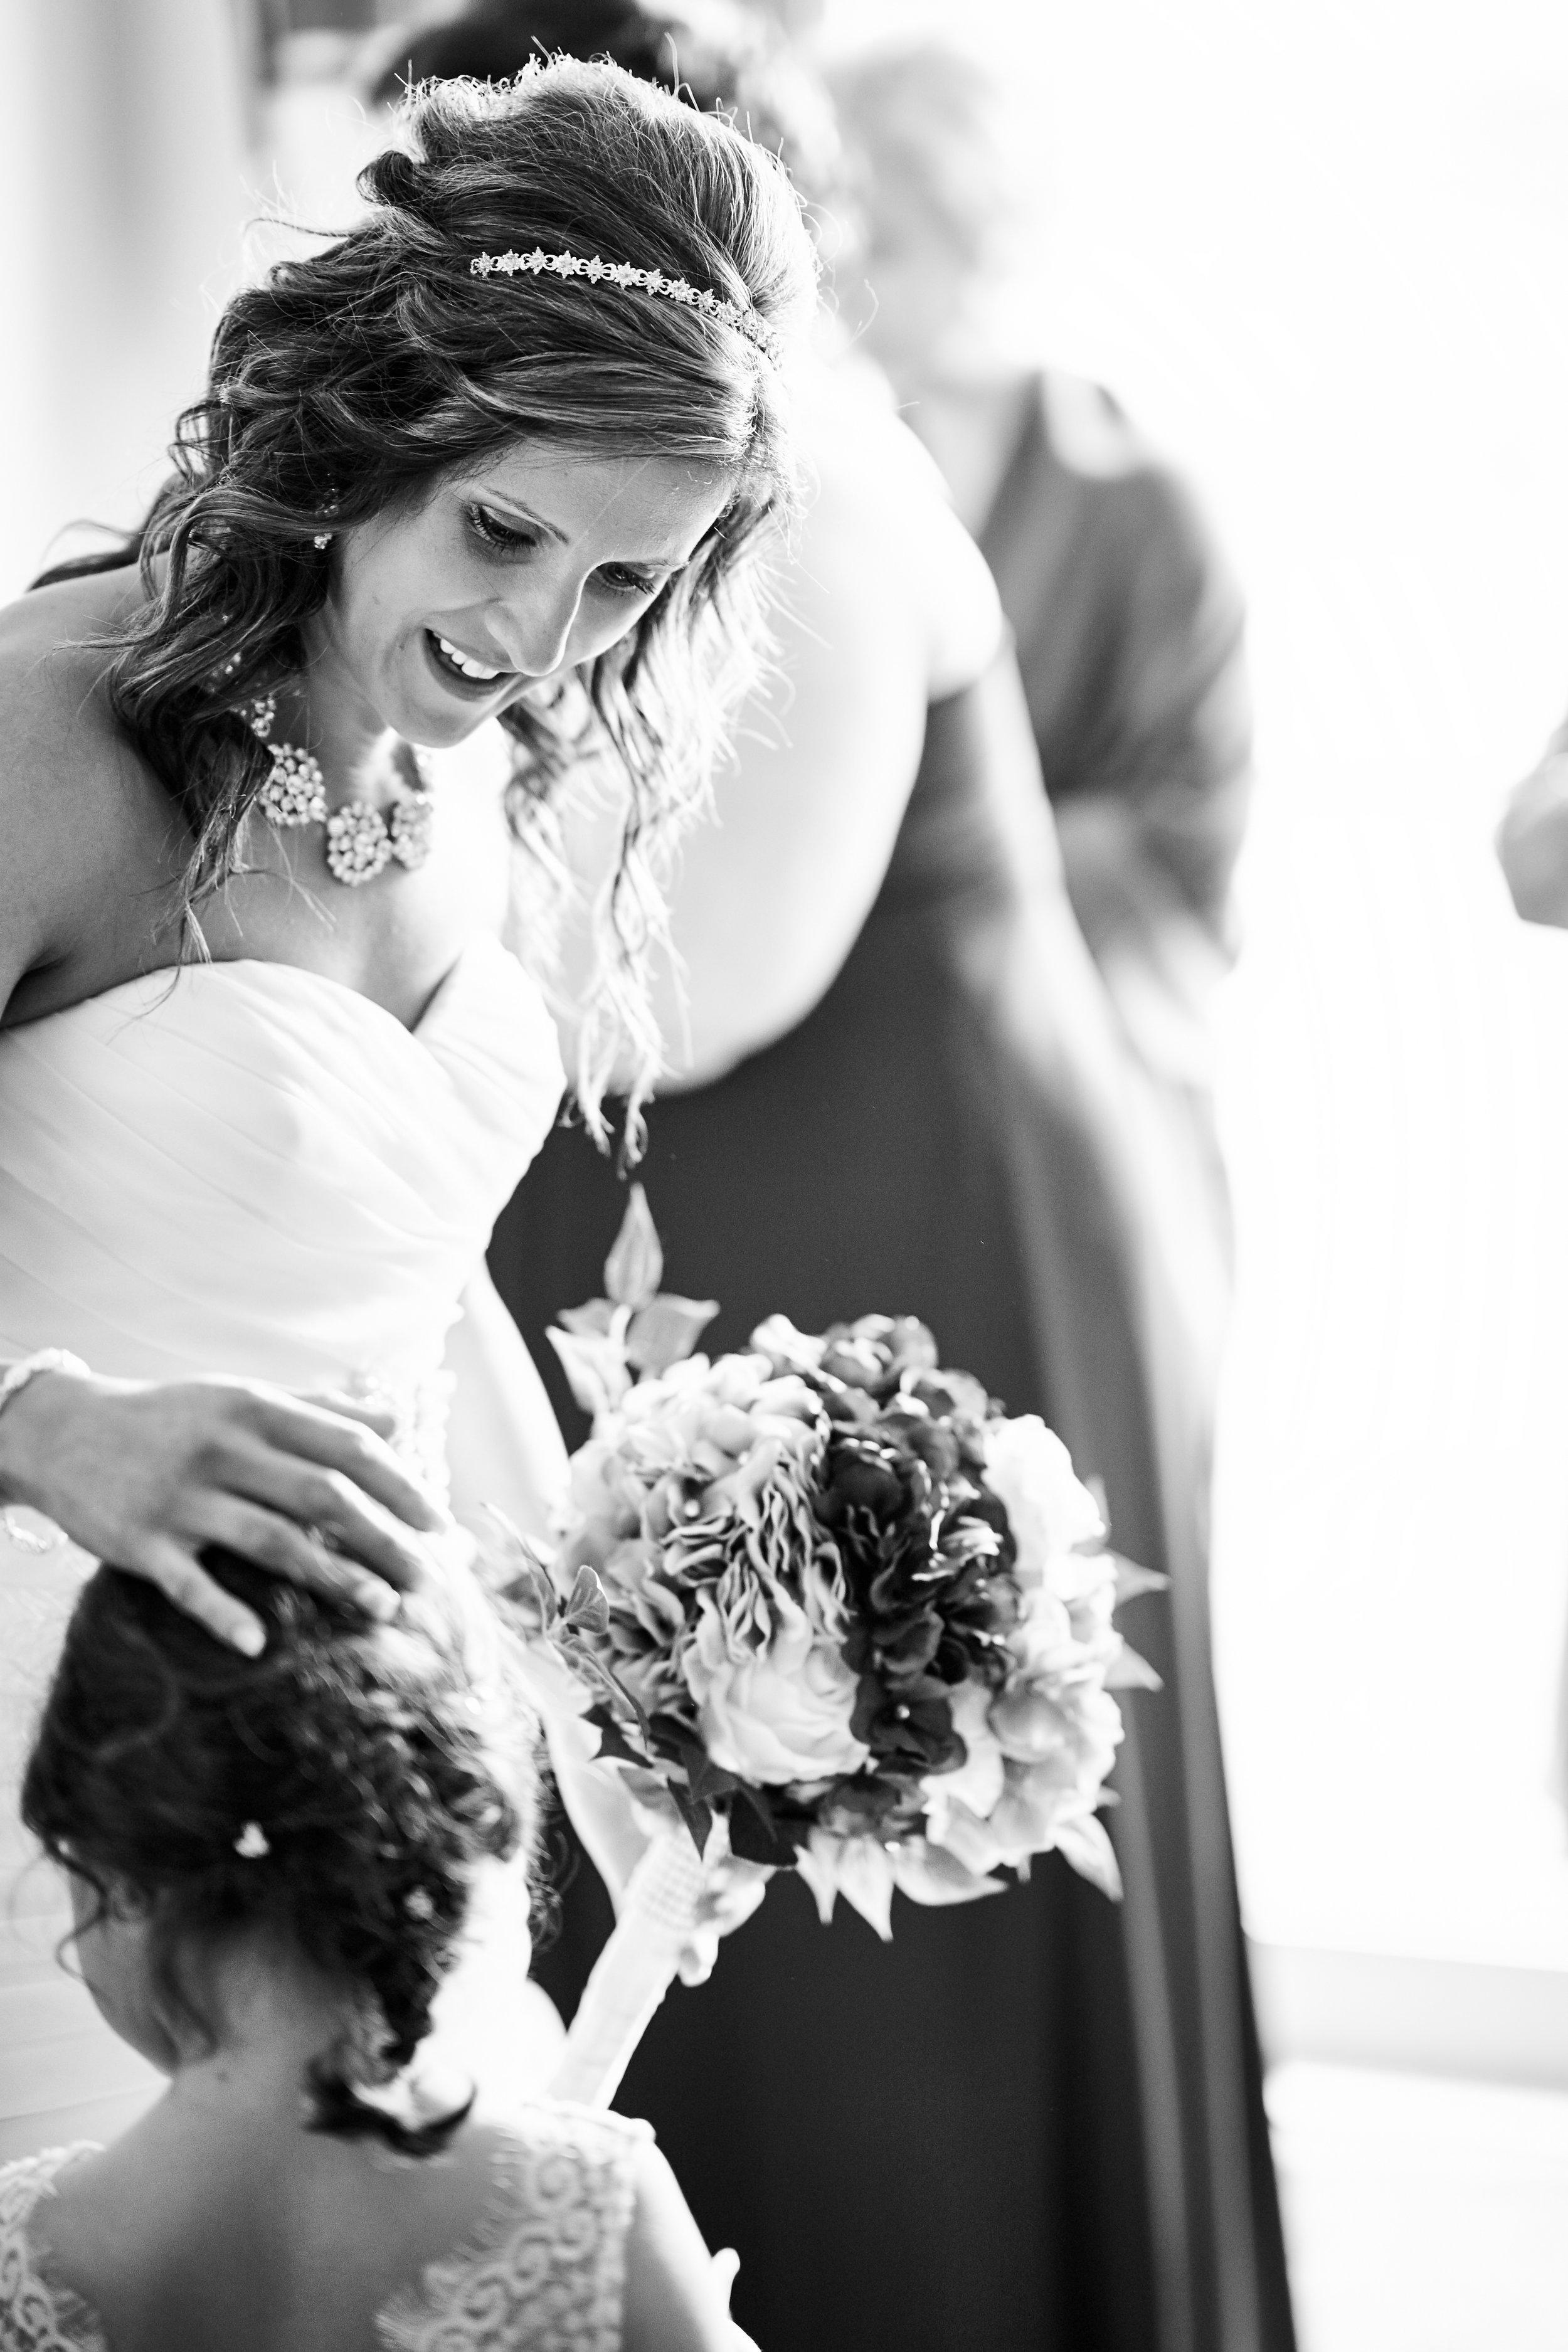 Jérémie & Julie's Wedding - 235.jpg